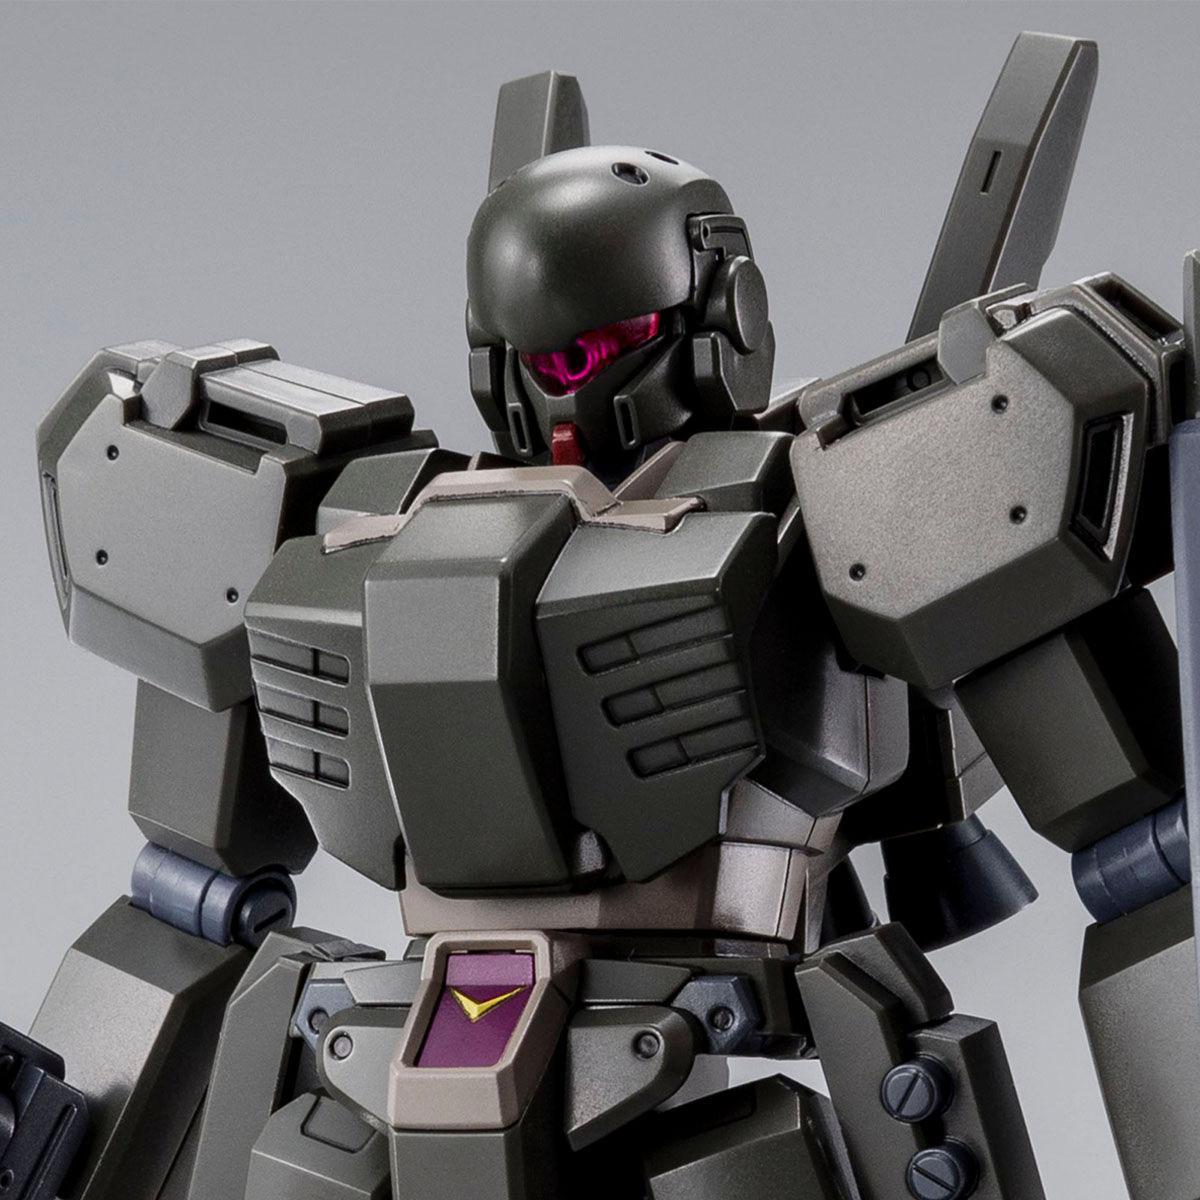 HG 1/144『ジェガンD型 (護衛隊仕様)』機動戦士ガンダムNT プラモデル-001